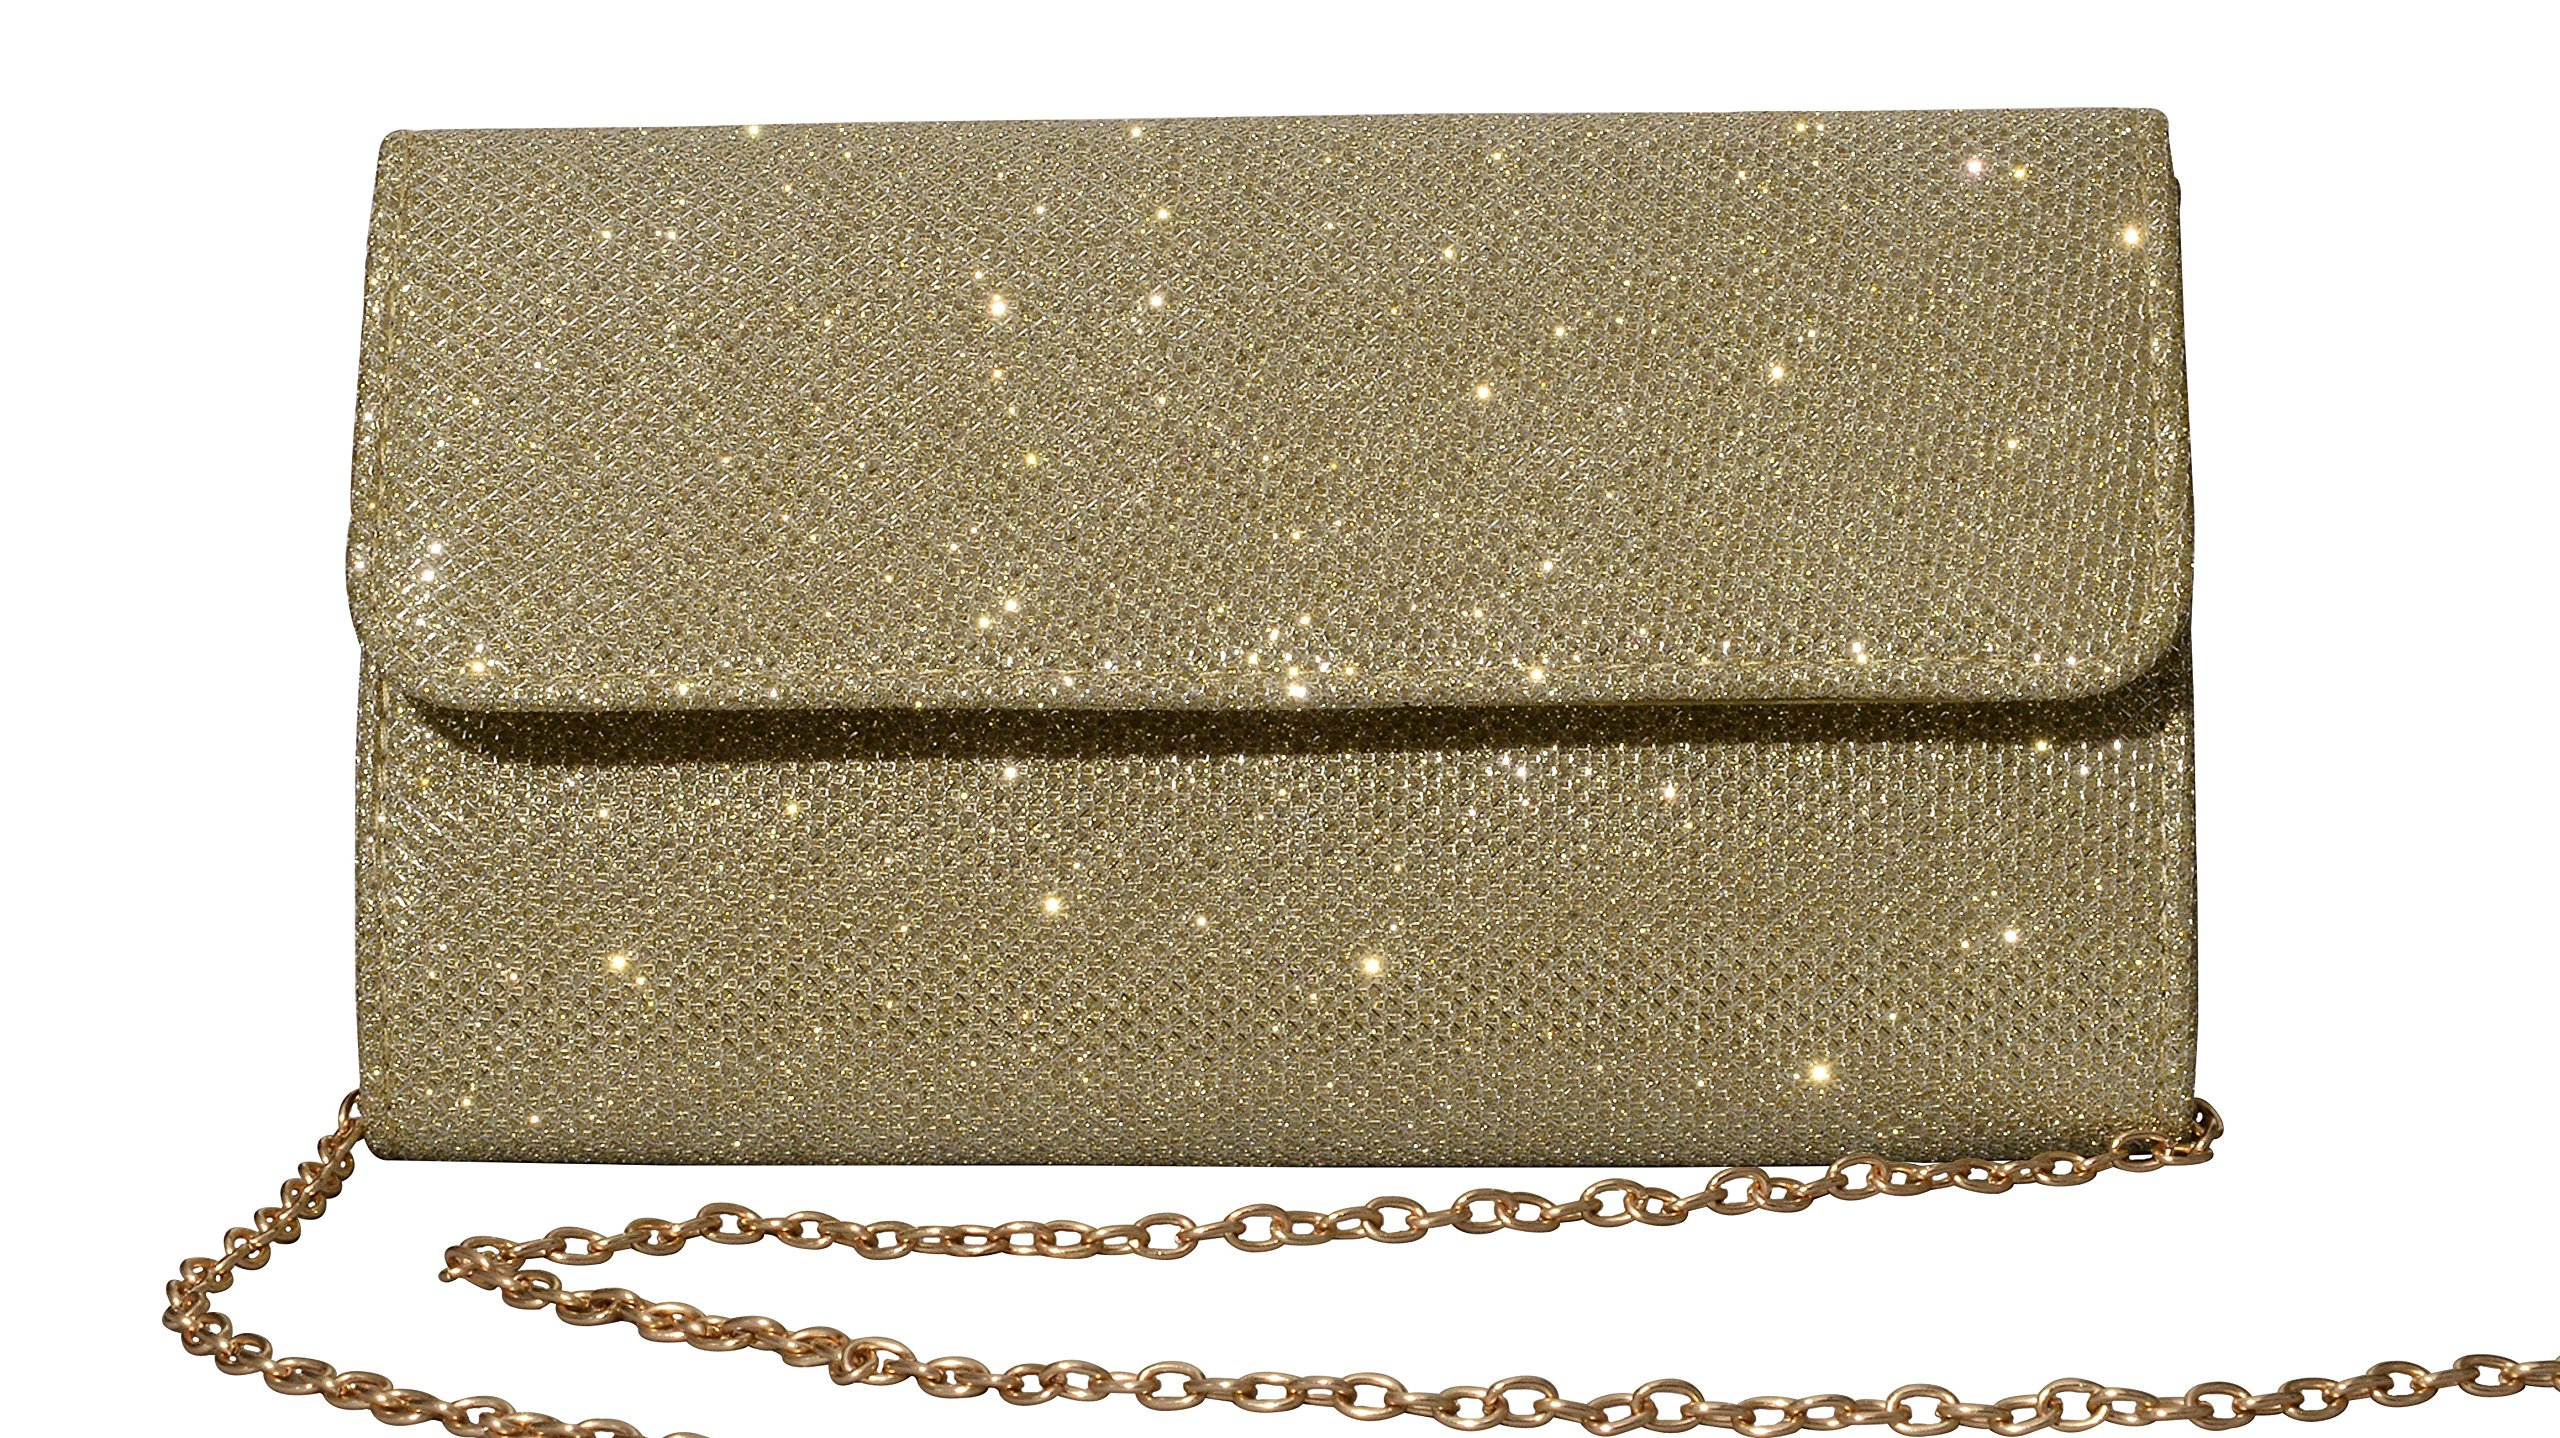 Outrip Women's Evening Bag Clutch Purse Glitter Party Wedding Handbag with Chain (Gold)